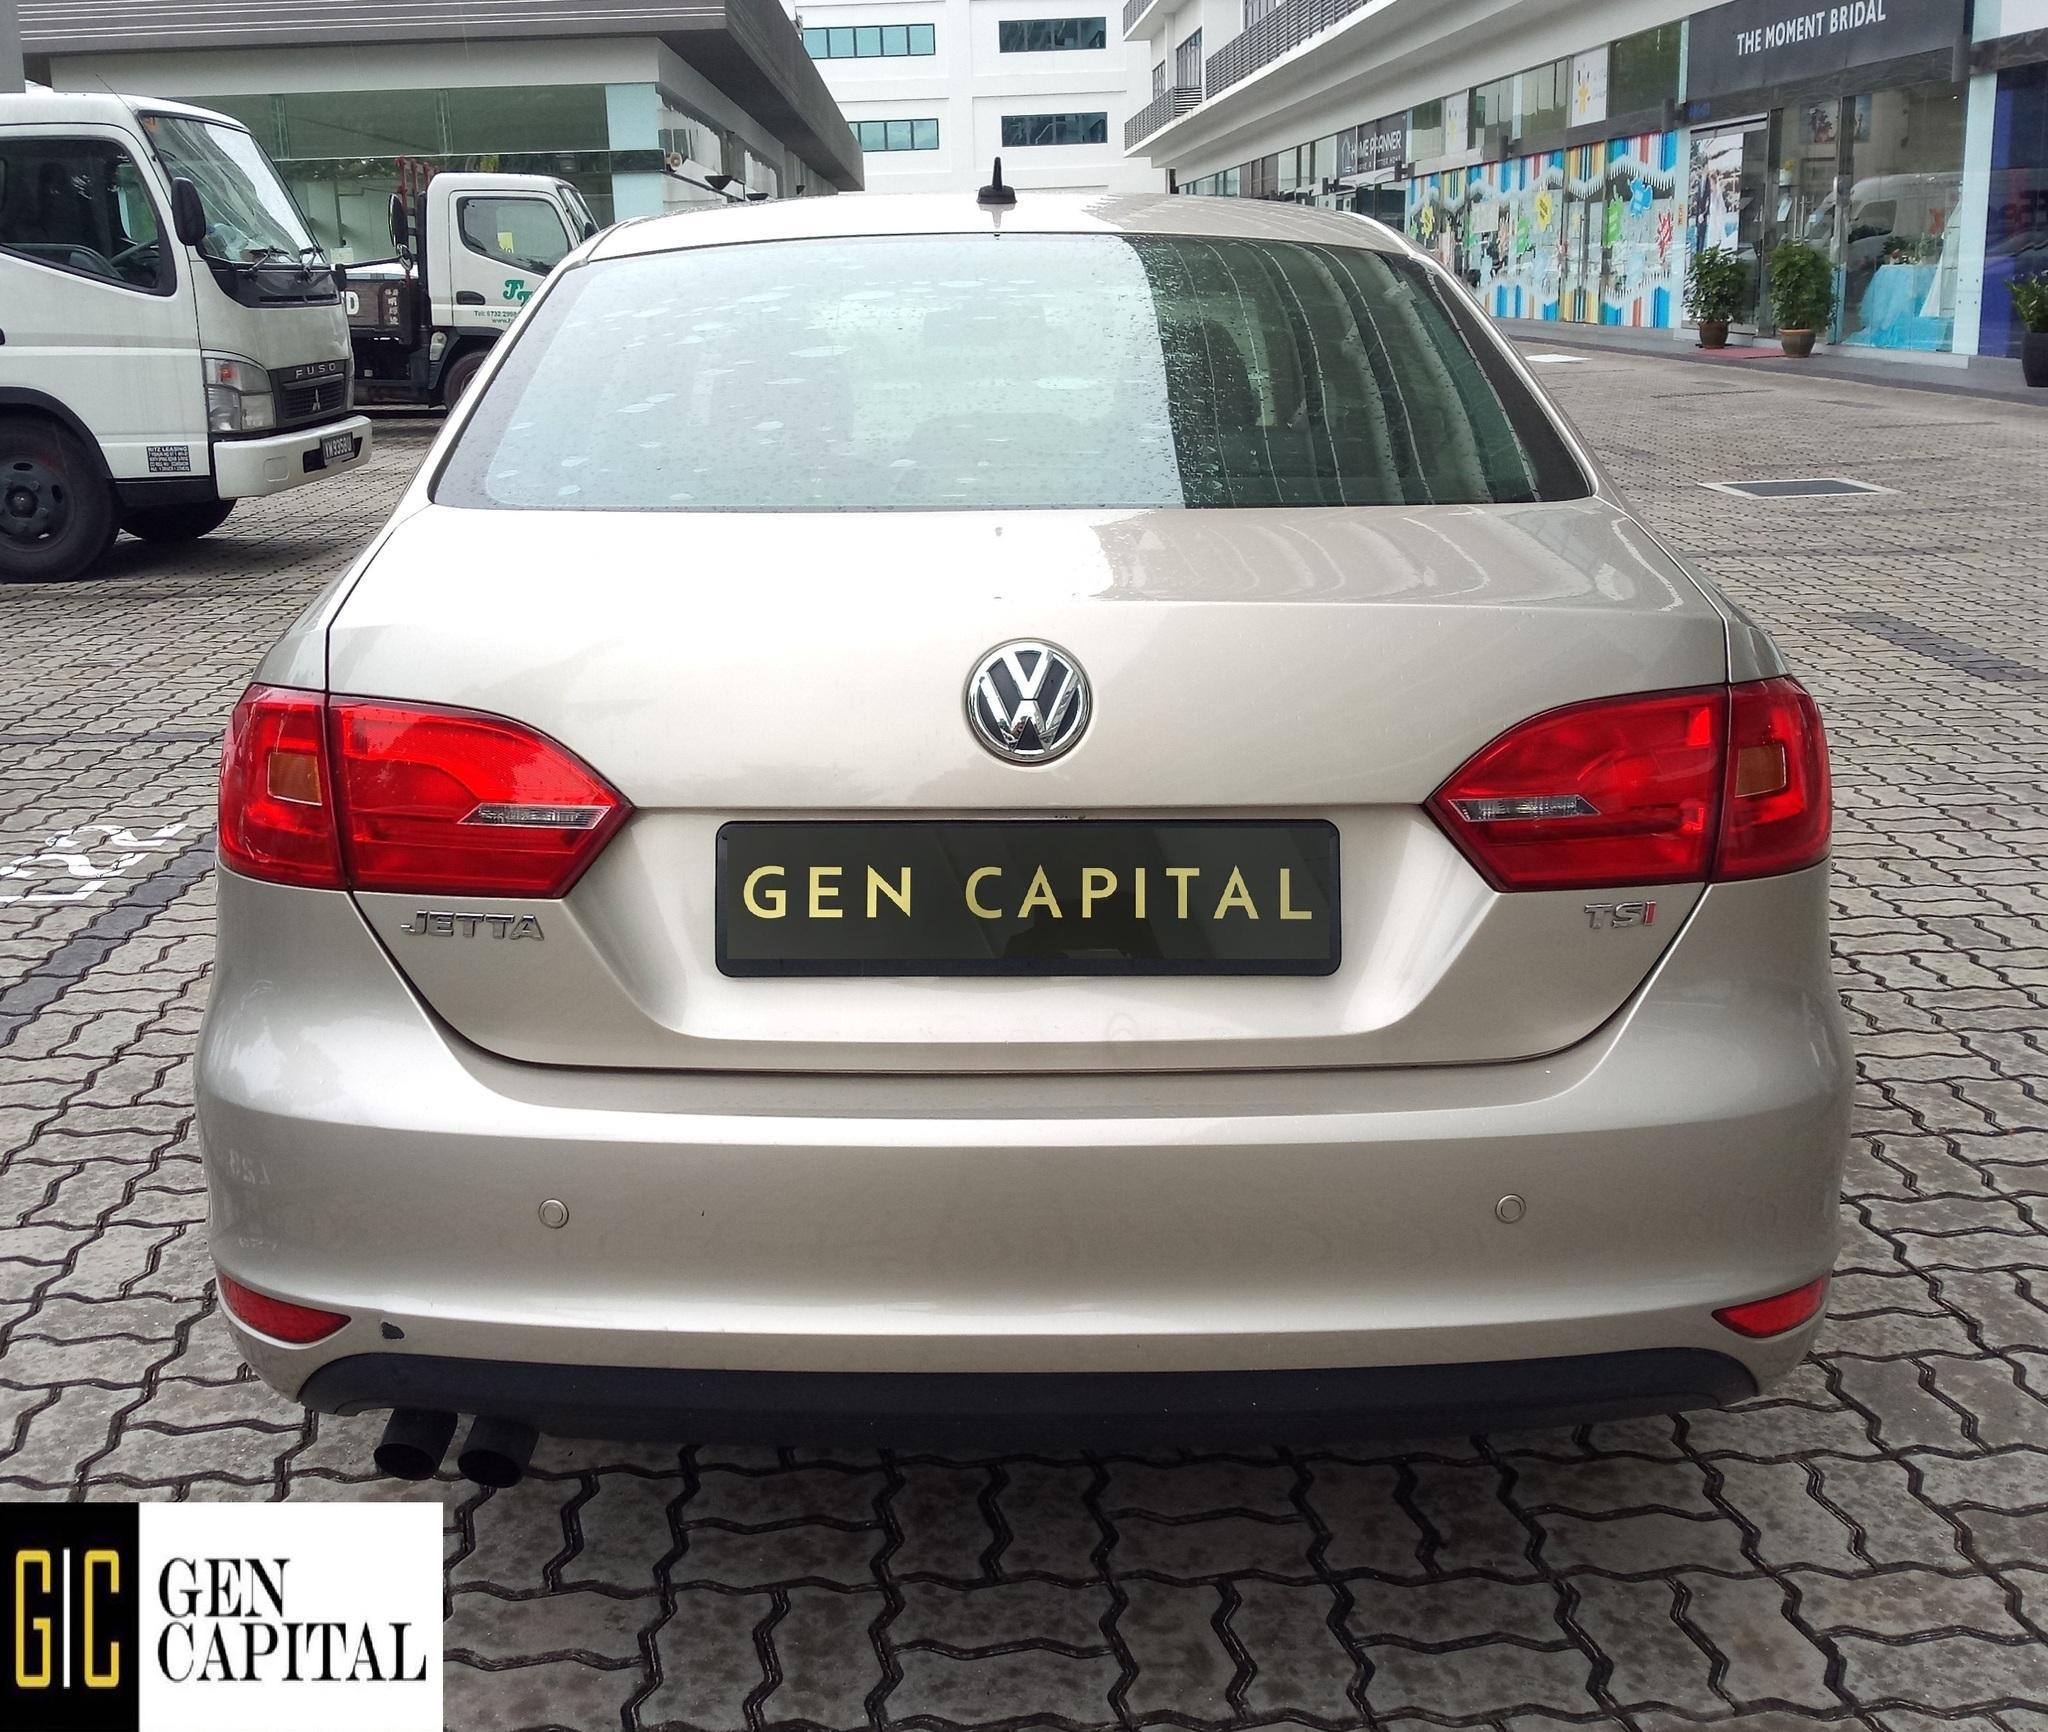 Volkswagen Jetta 1.4A Grab Gojek Ryde Tada & Non PHV Car Rental